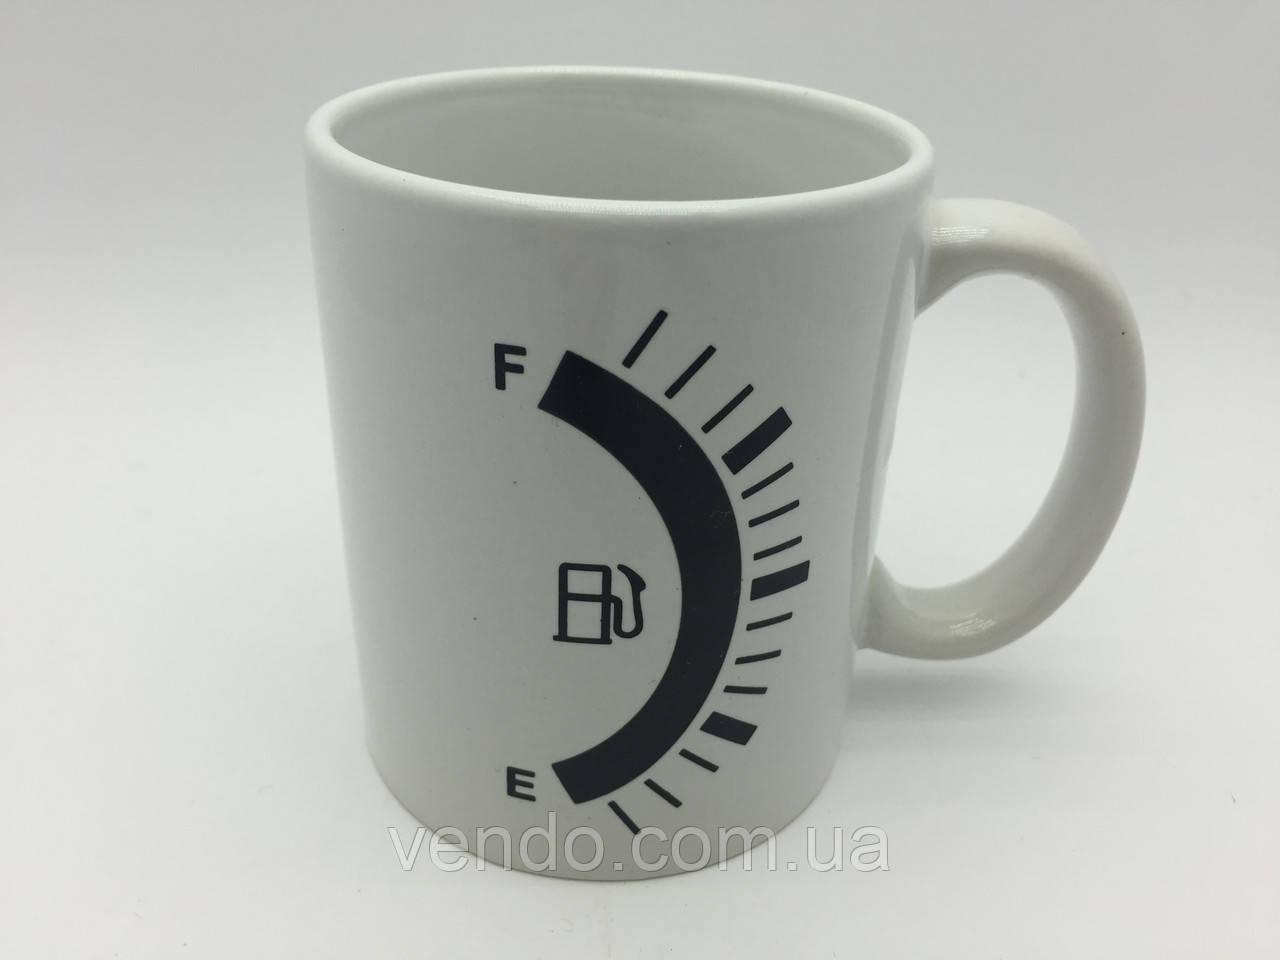 Кружка-чашка хамелеон Бензоколонка/Заправка белая